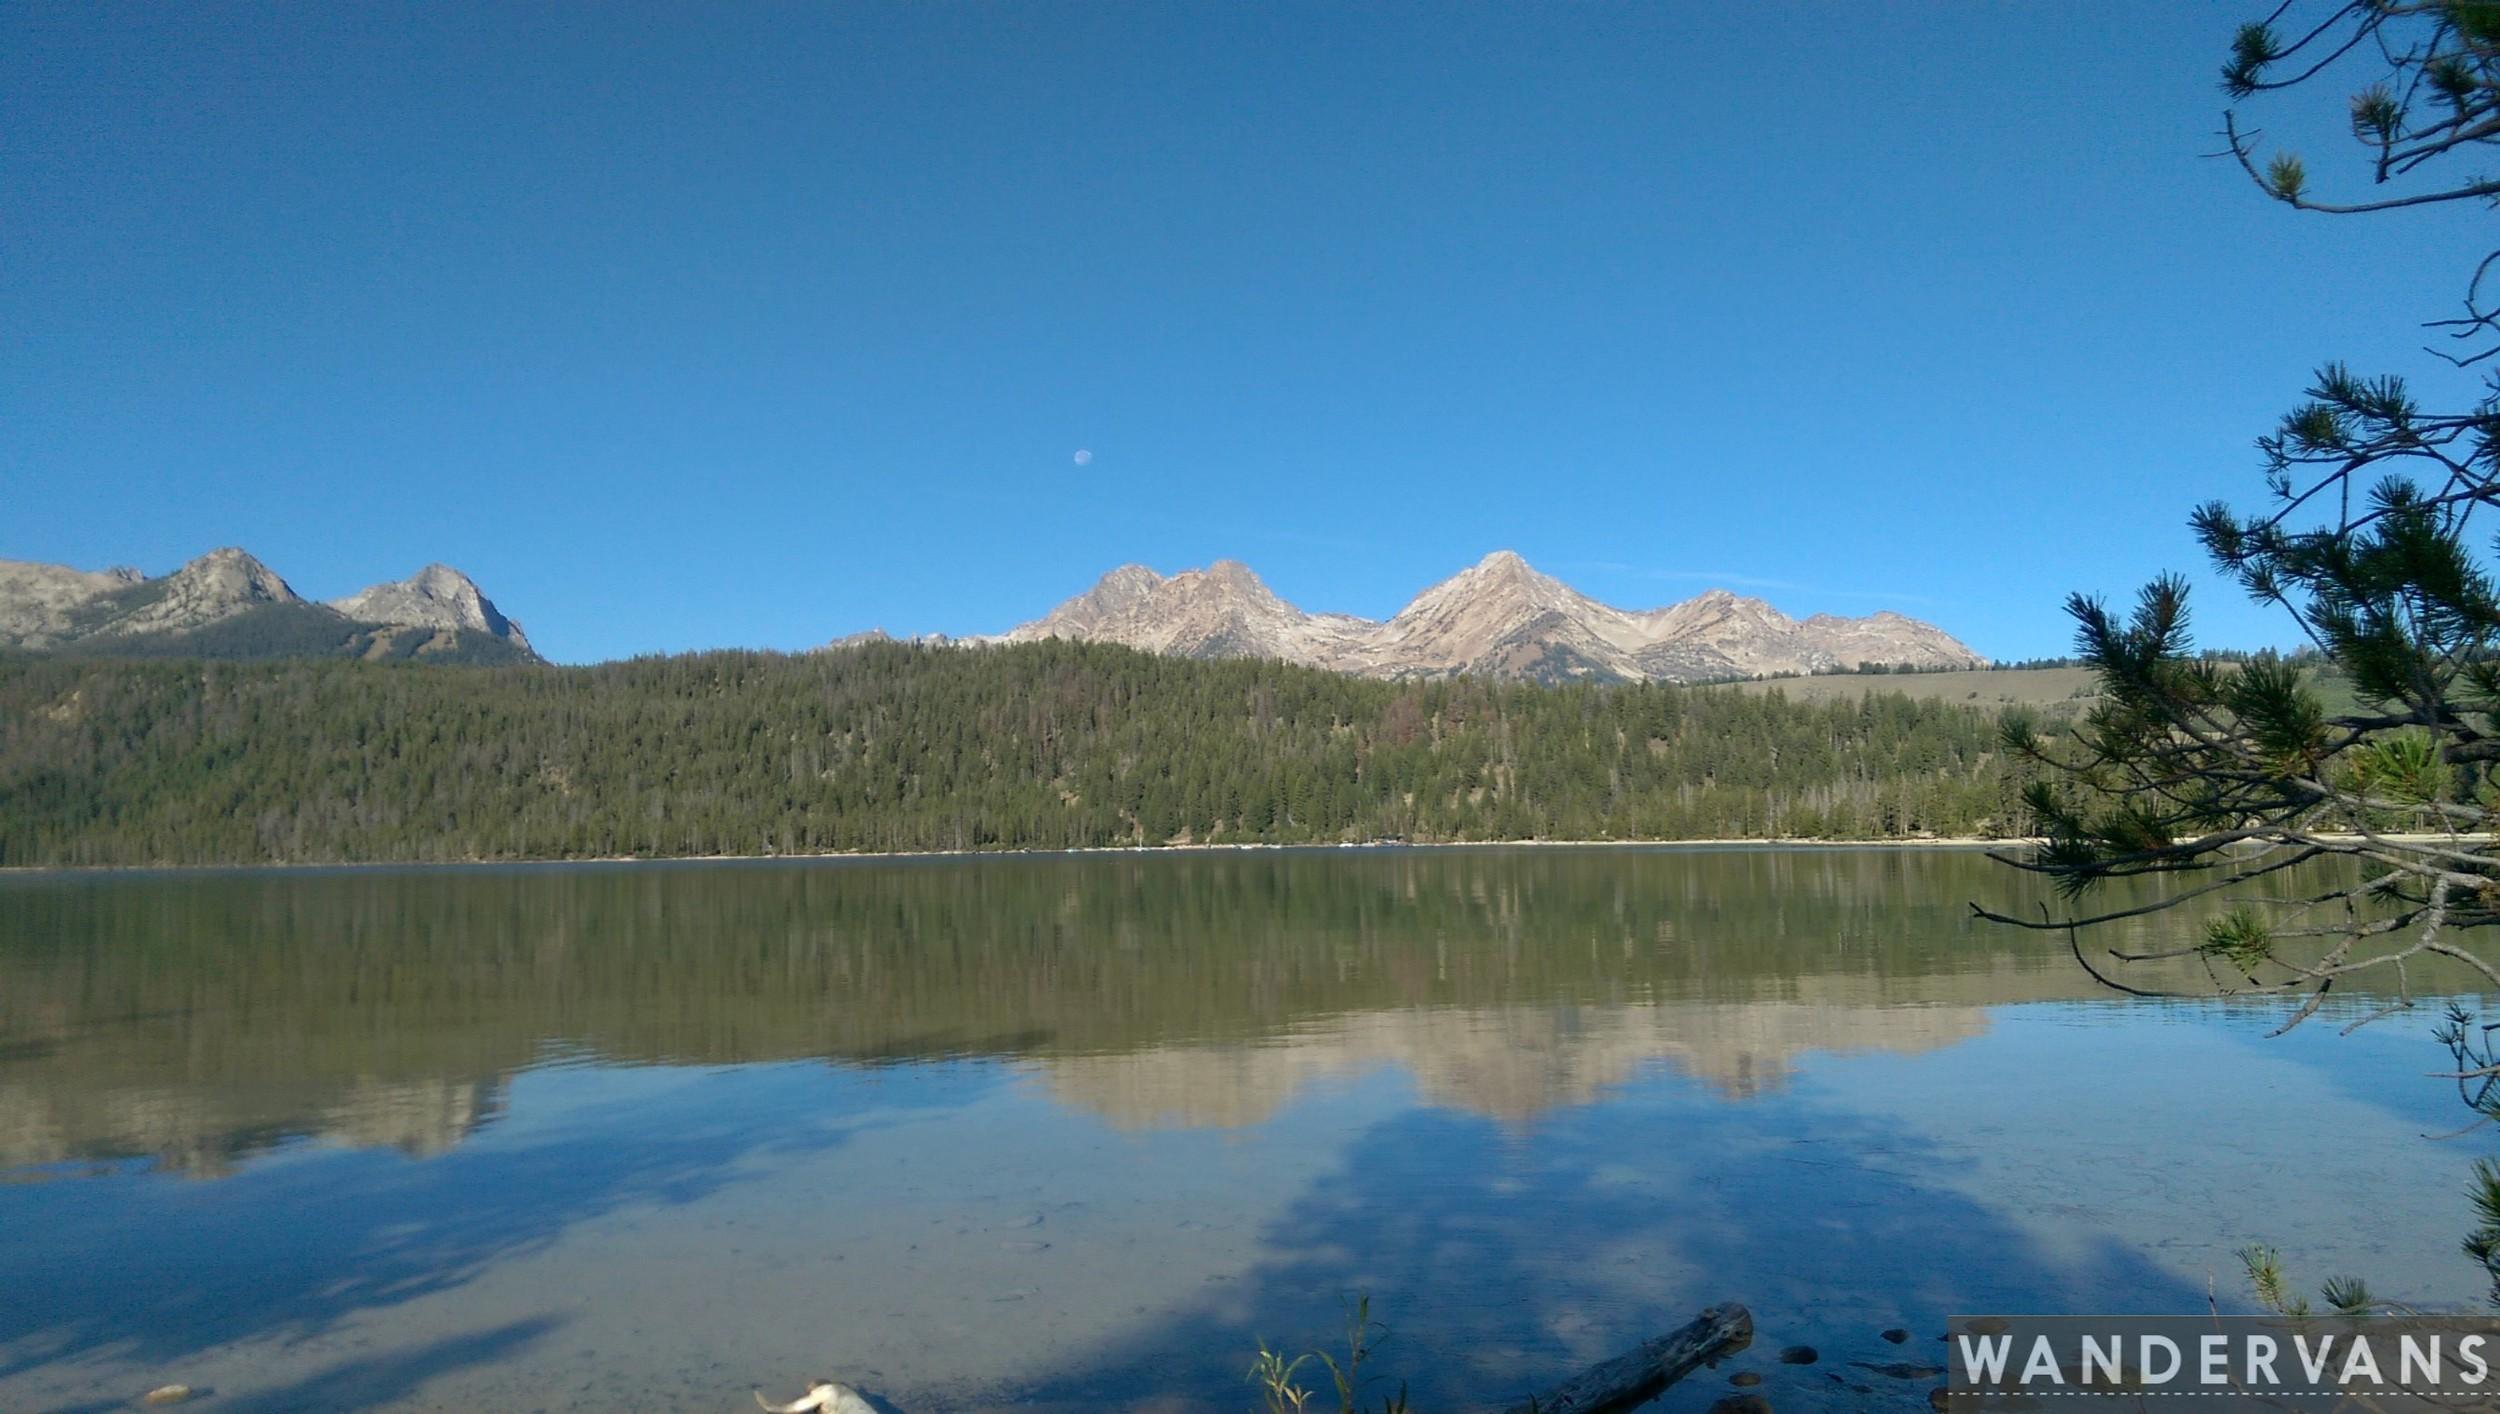 vanlife-rv-campervan-rent-idaho-sun-valley-boise-wandervans-wanderlust-skiing-backcountry-snowboard-sawtooth-sun-valley-biking-hiking-stanley-outsidevan